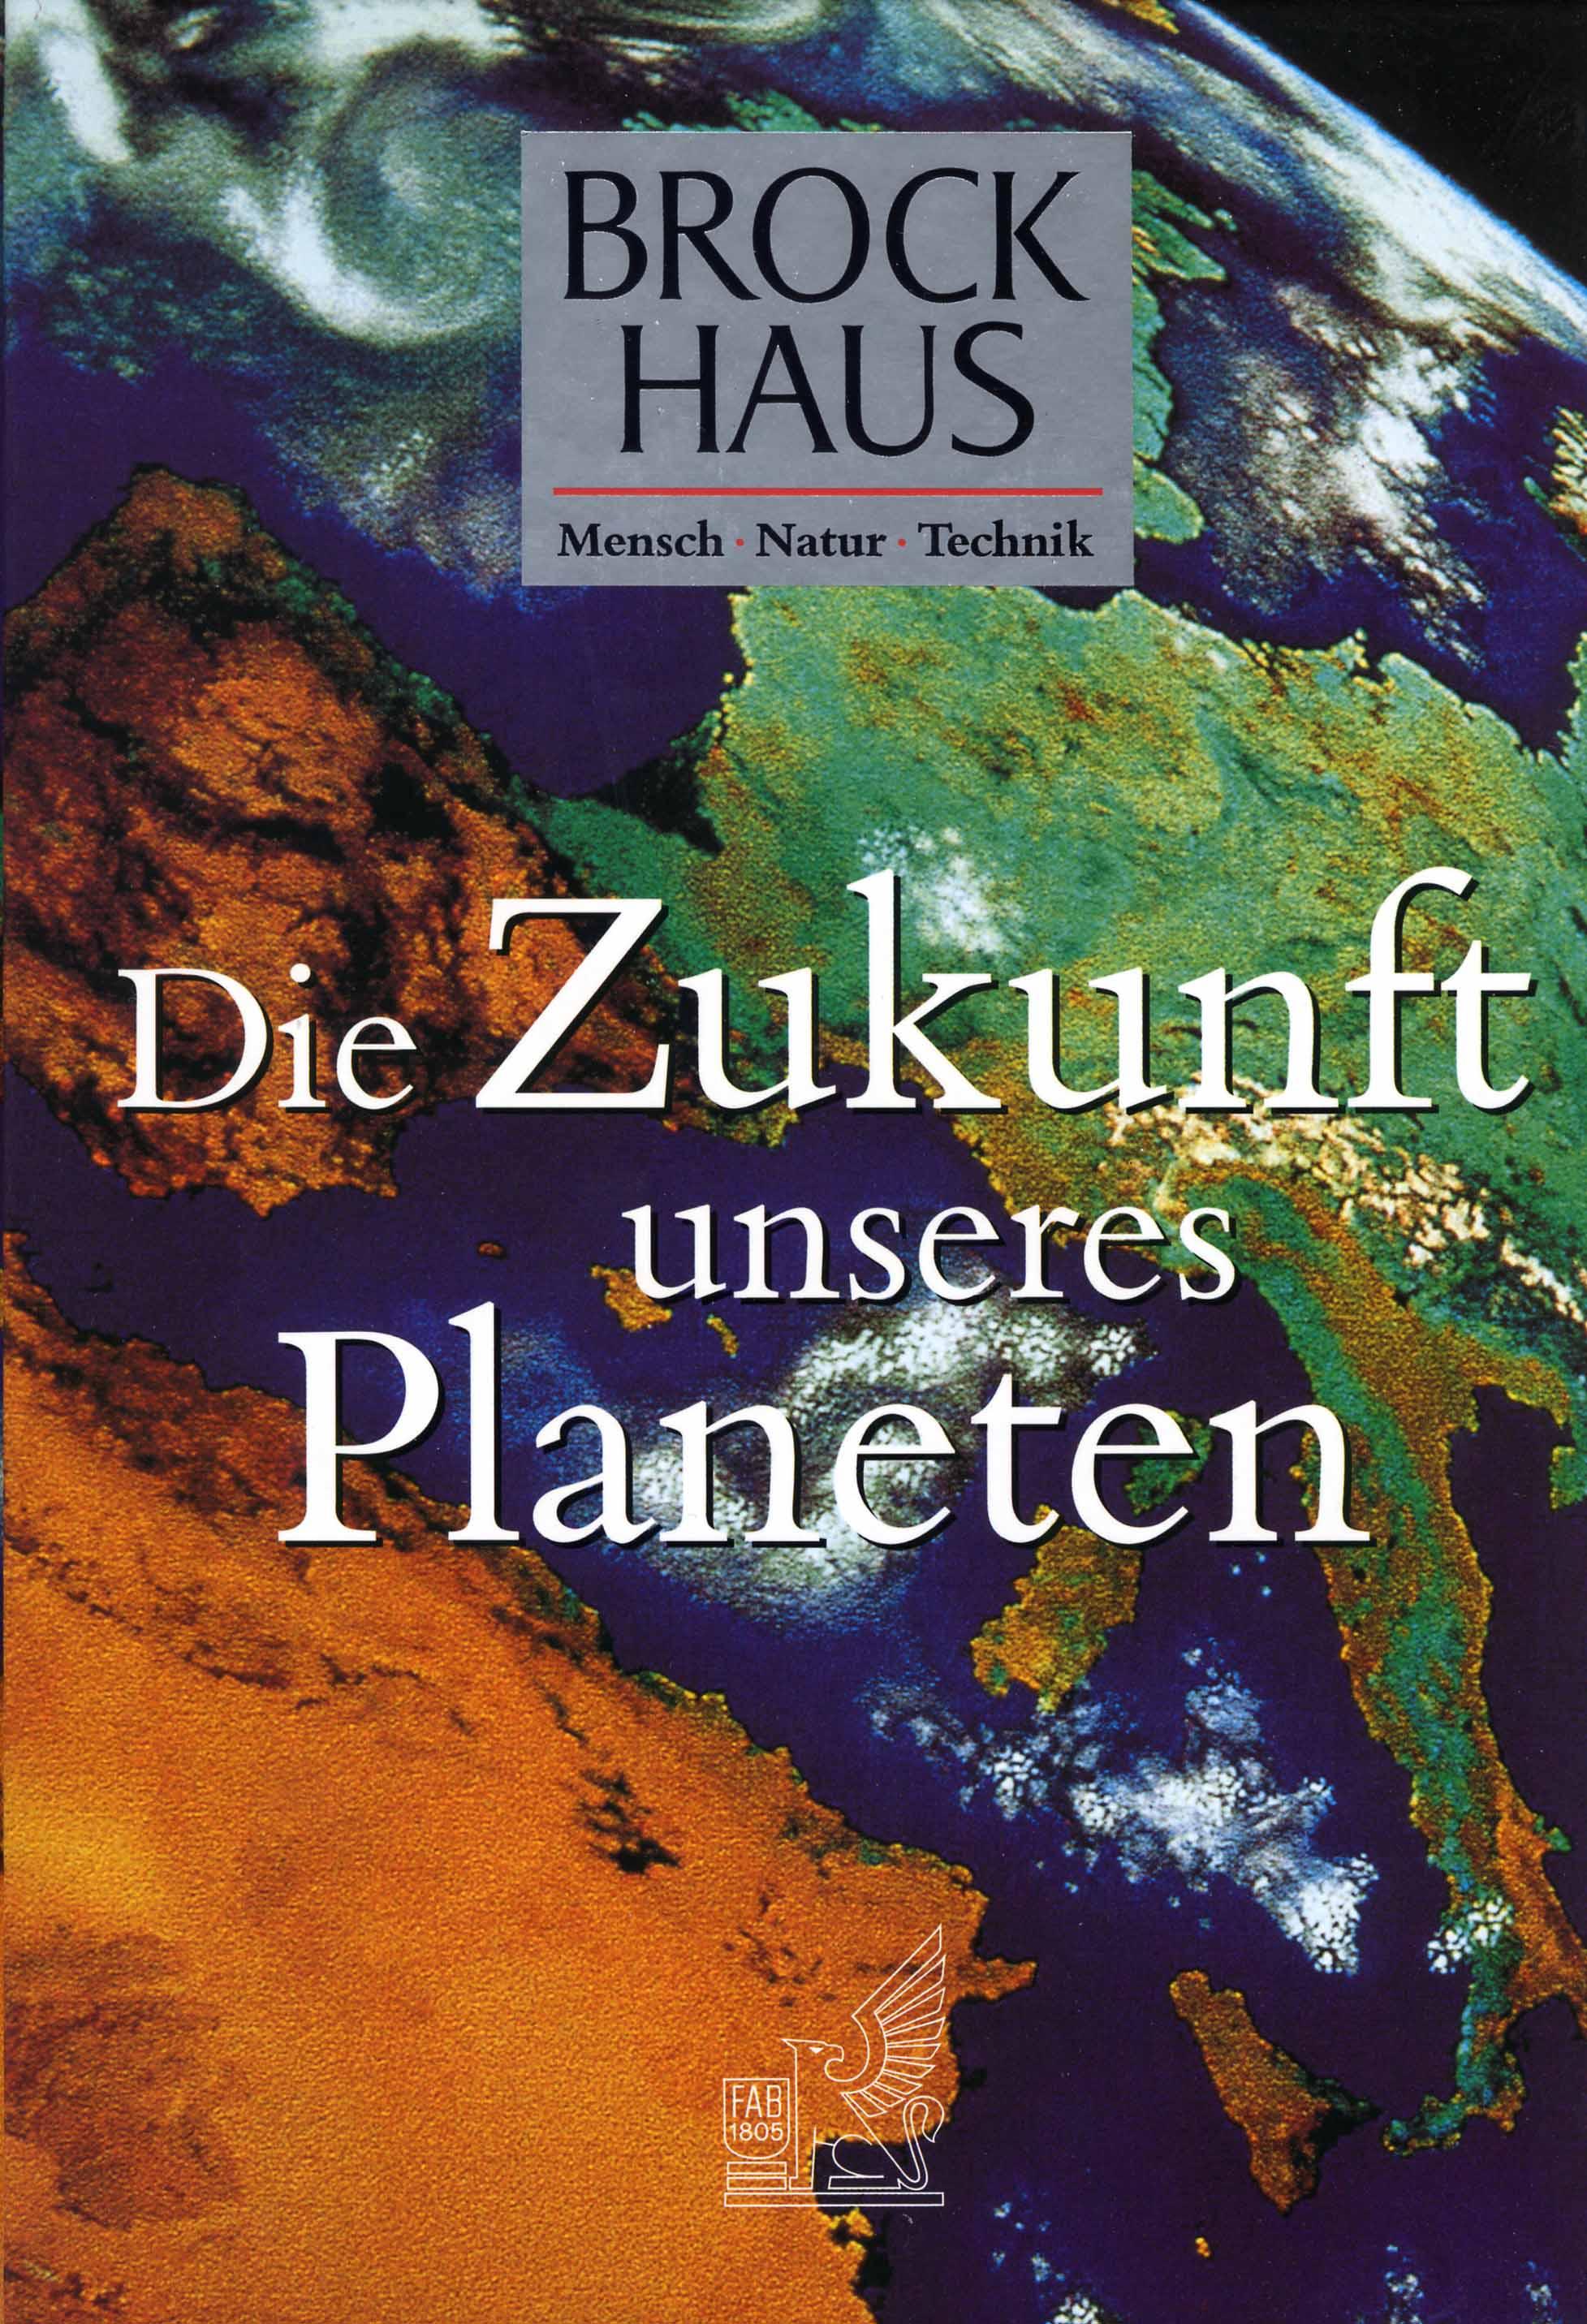 ZukunftPlanet Brockhaus-Verlag